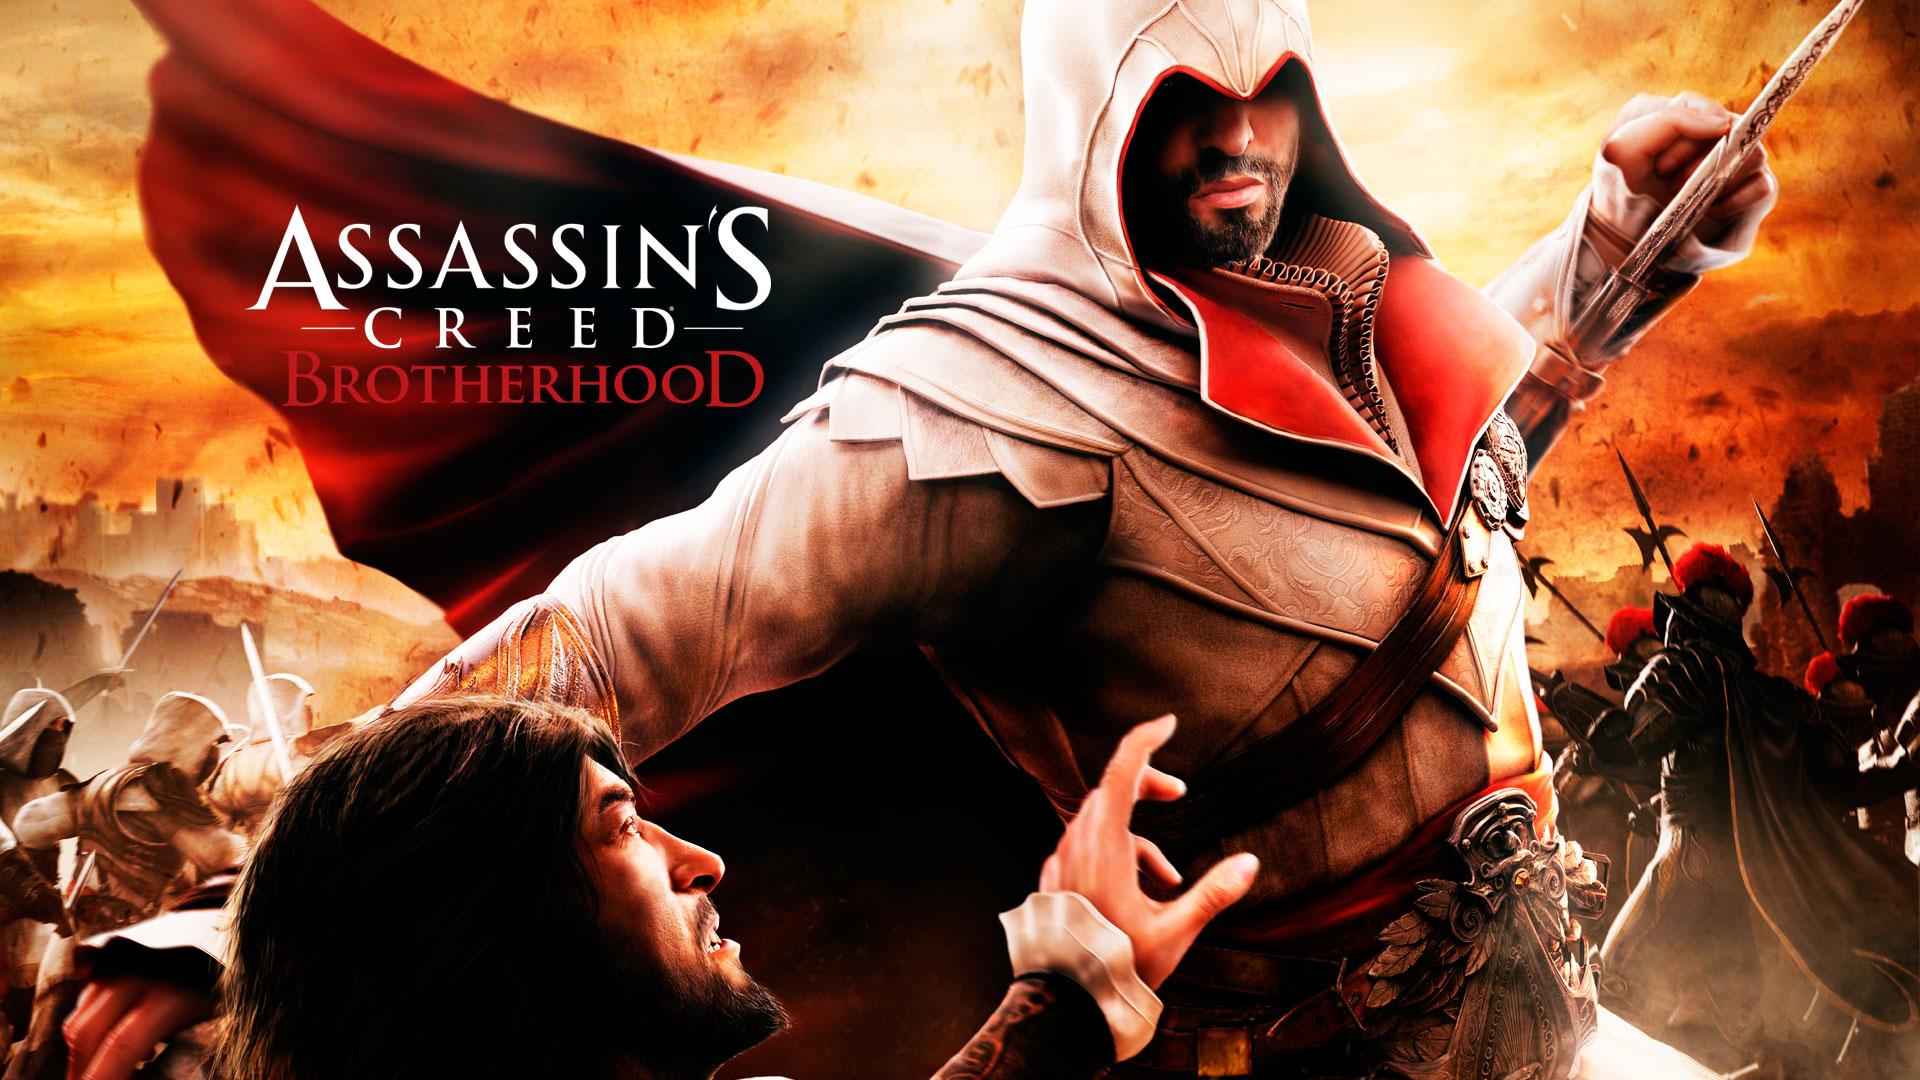 Assassins Creed Brotherhood wallpaper 44272 1920x1080